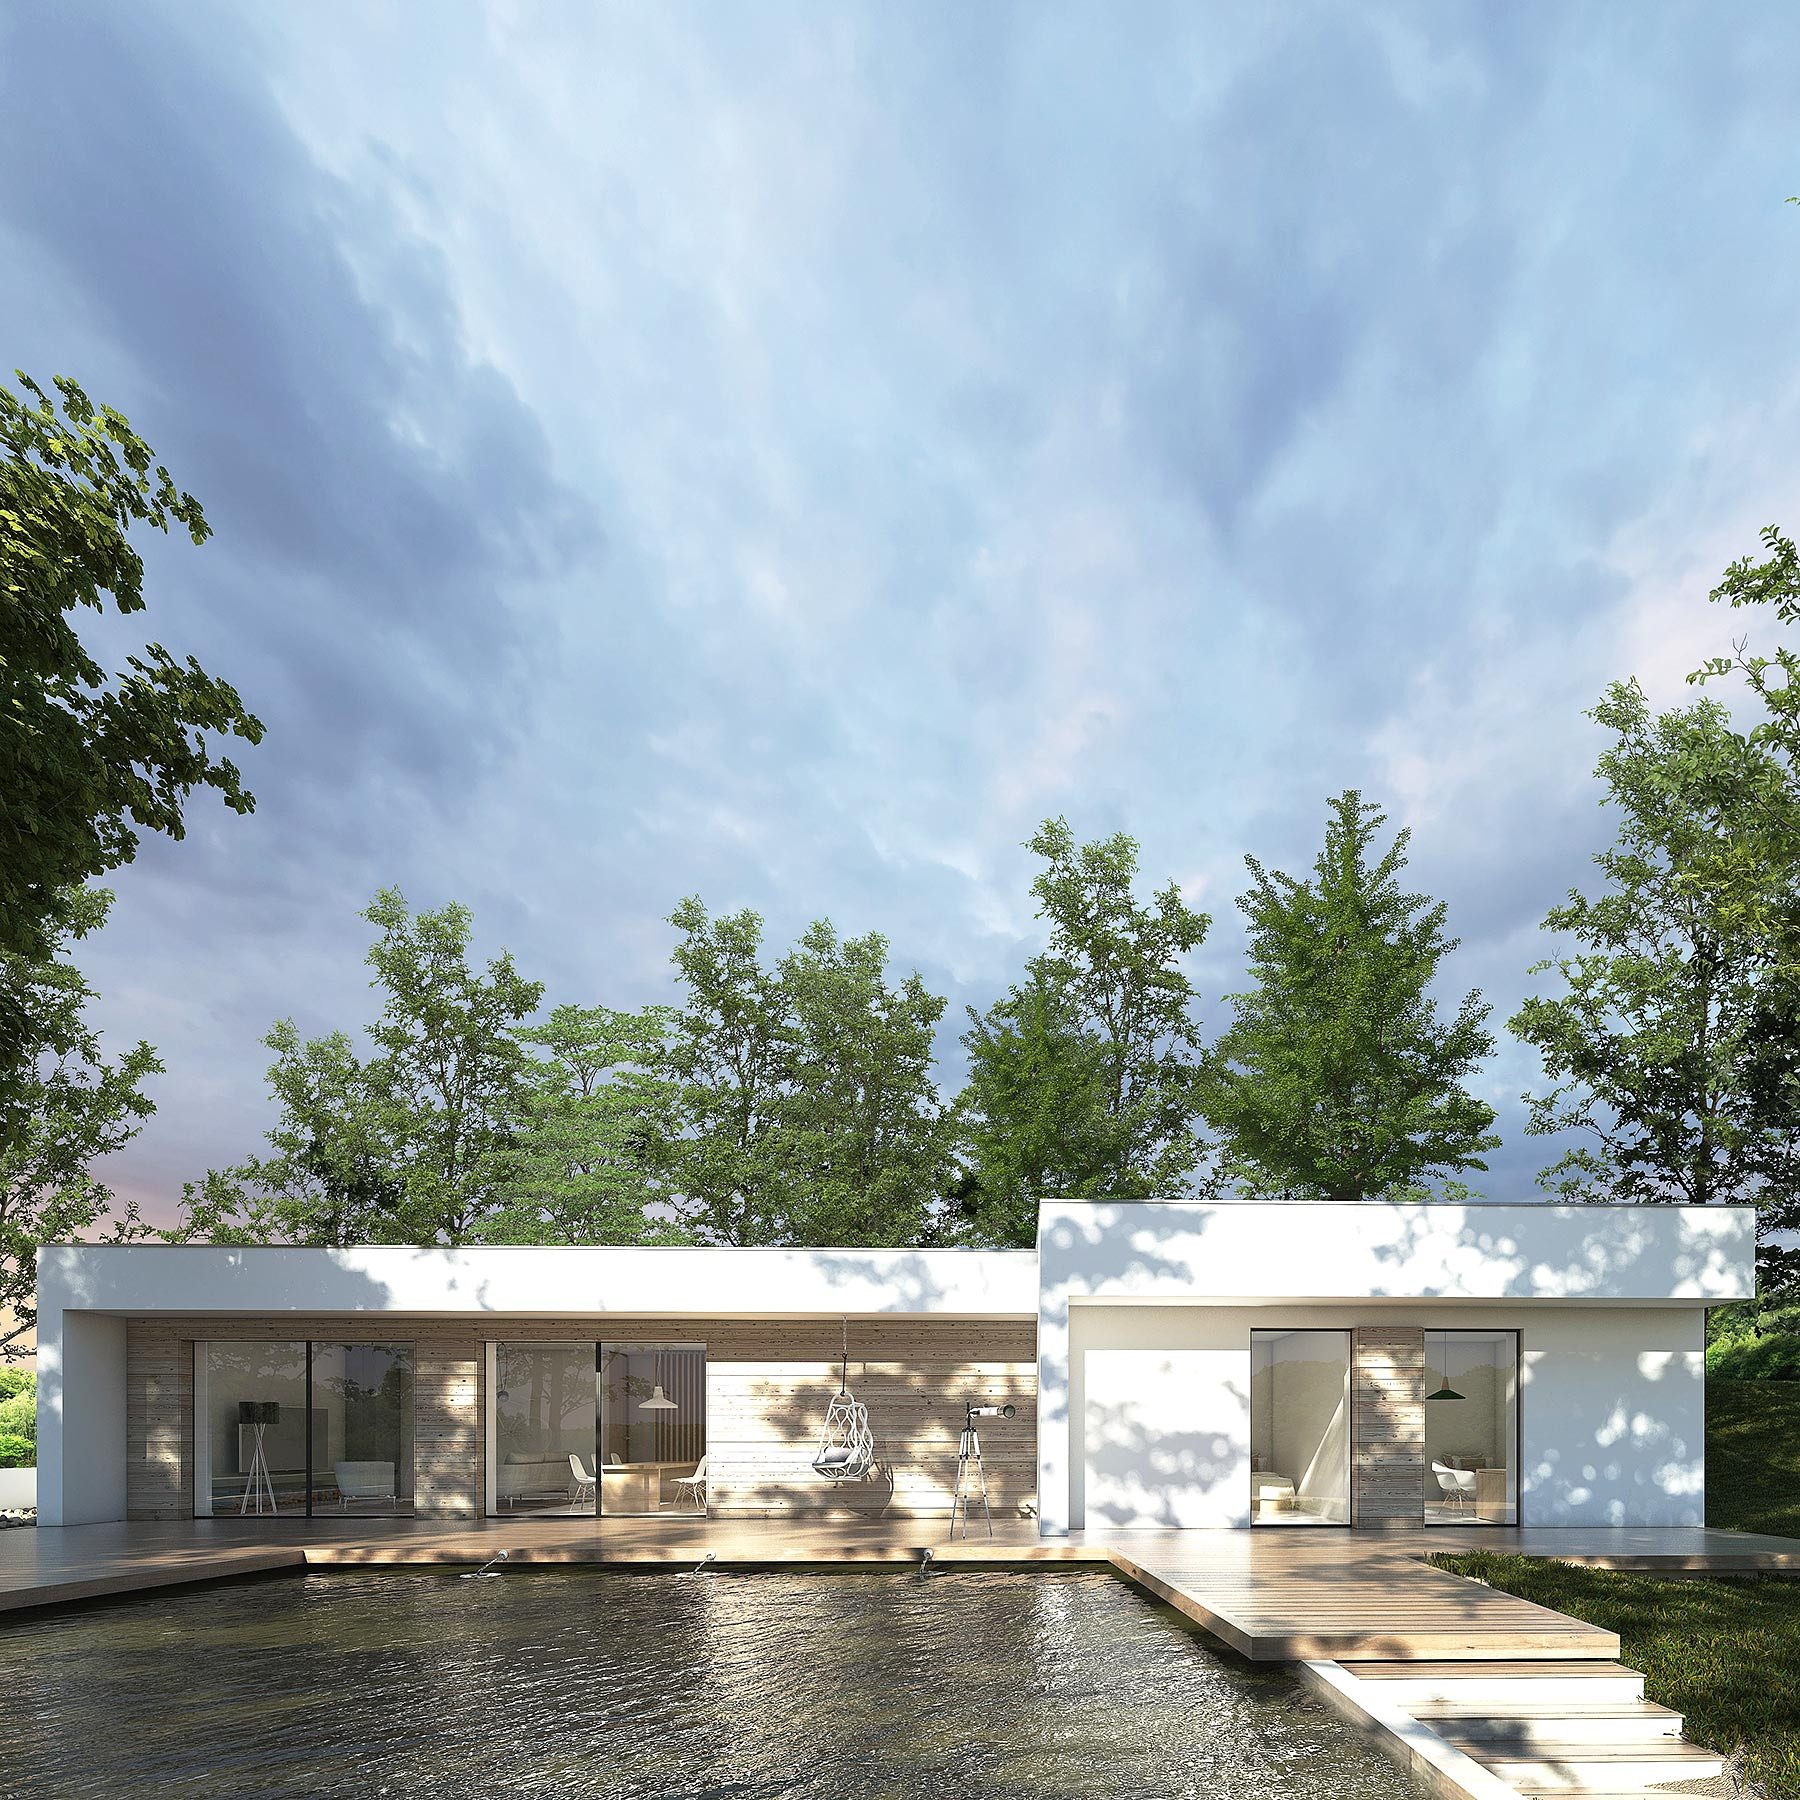 moderni_jednopodlazni_rodinny_dum_s_plochou_strechou_dream_homes_plavec_front